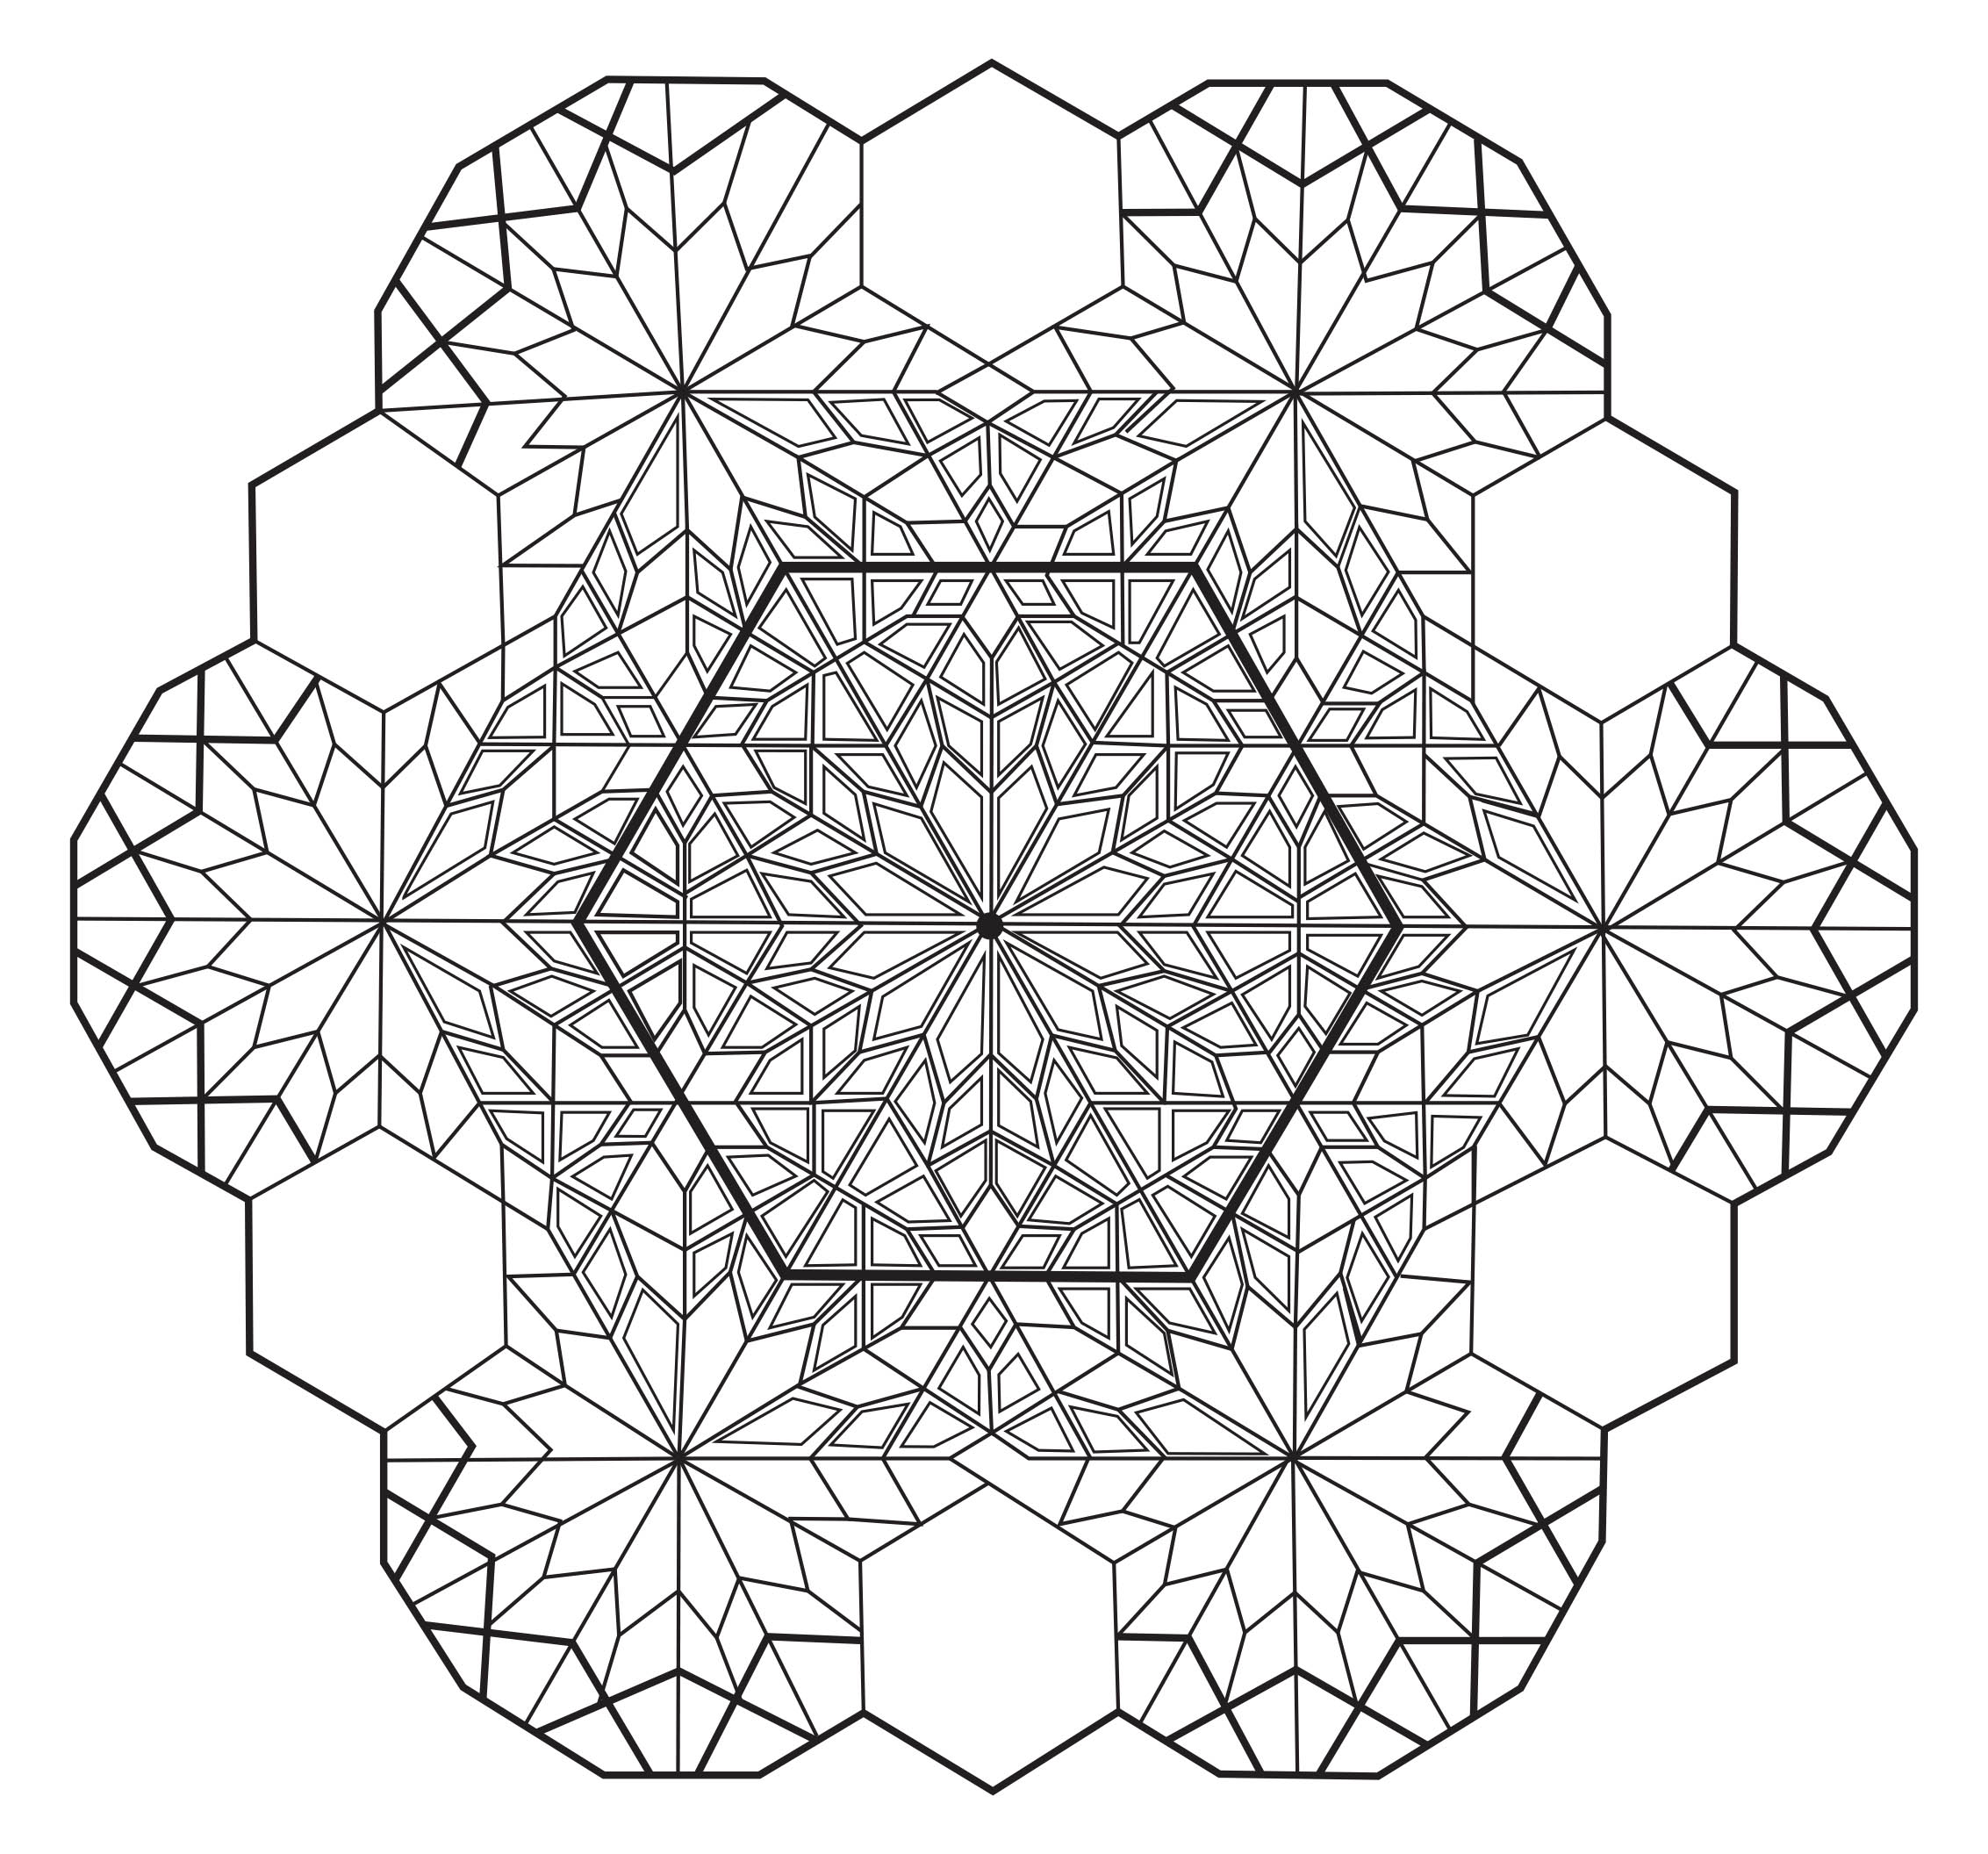 Mandala zen antistress 4 mandalas coloriages difficiles pour adultes - Dessin anti stress mandala ...